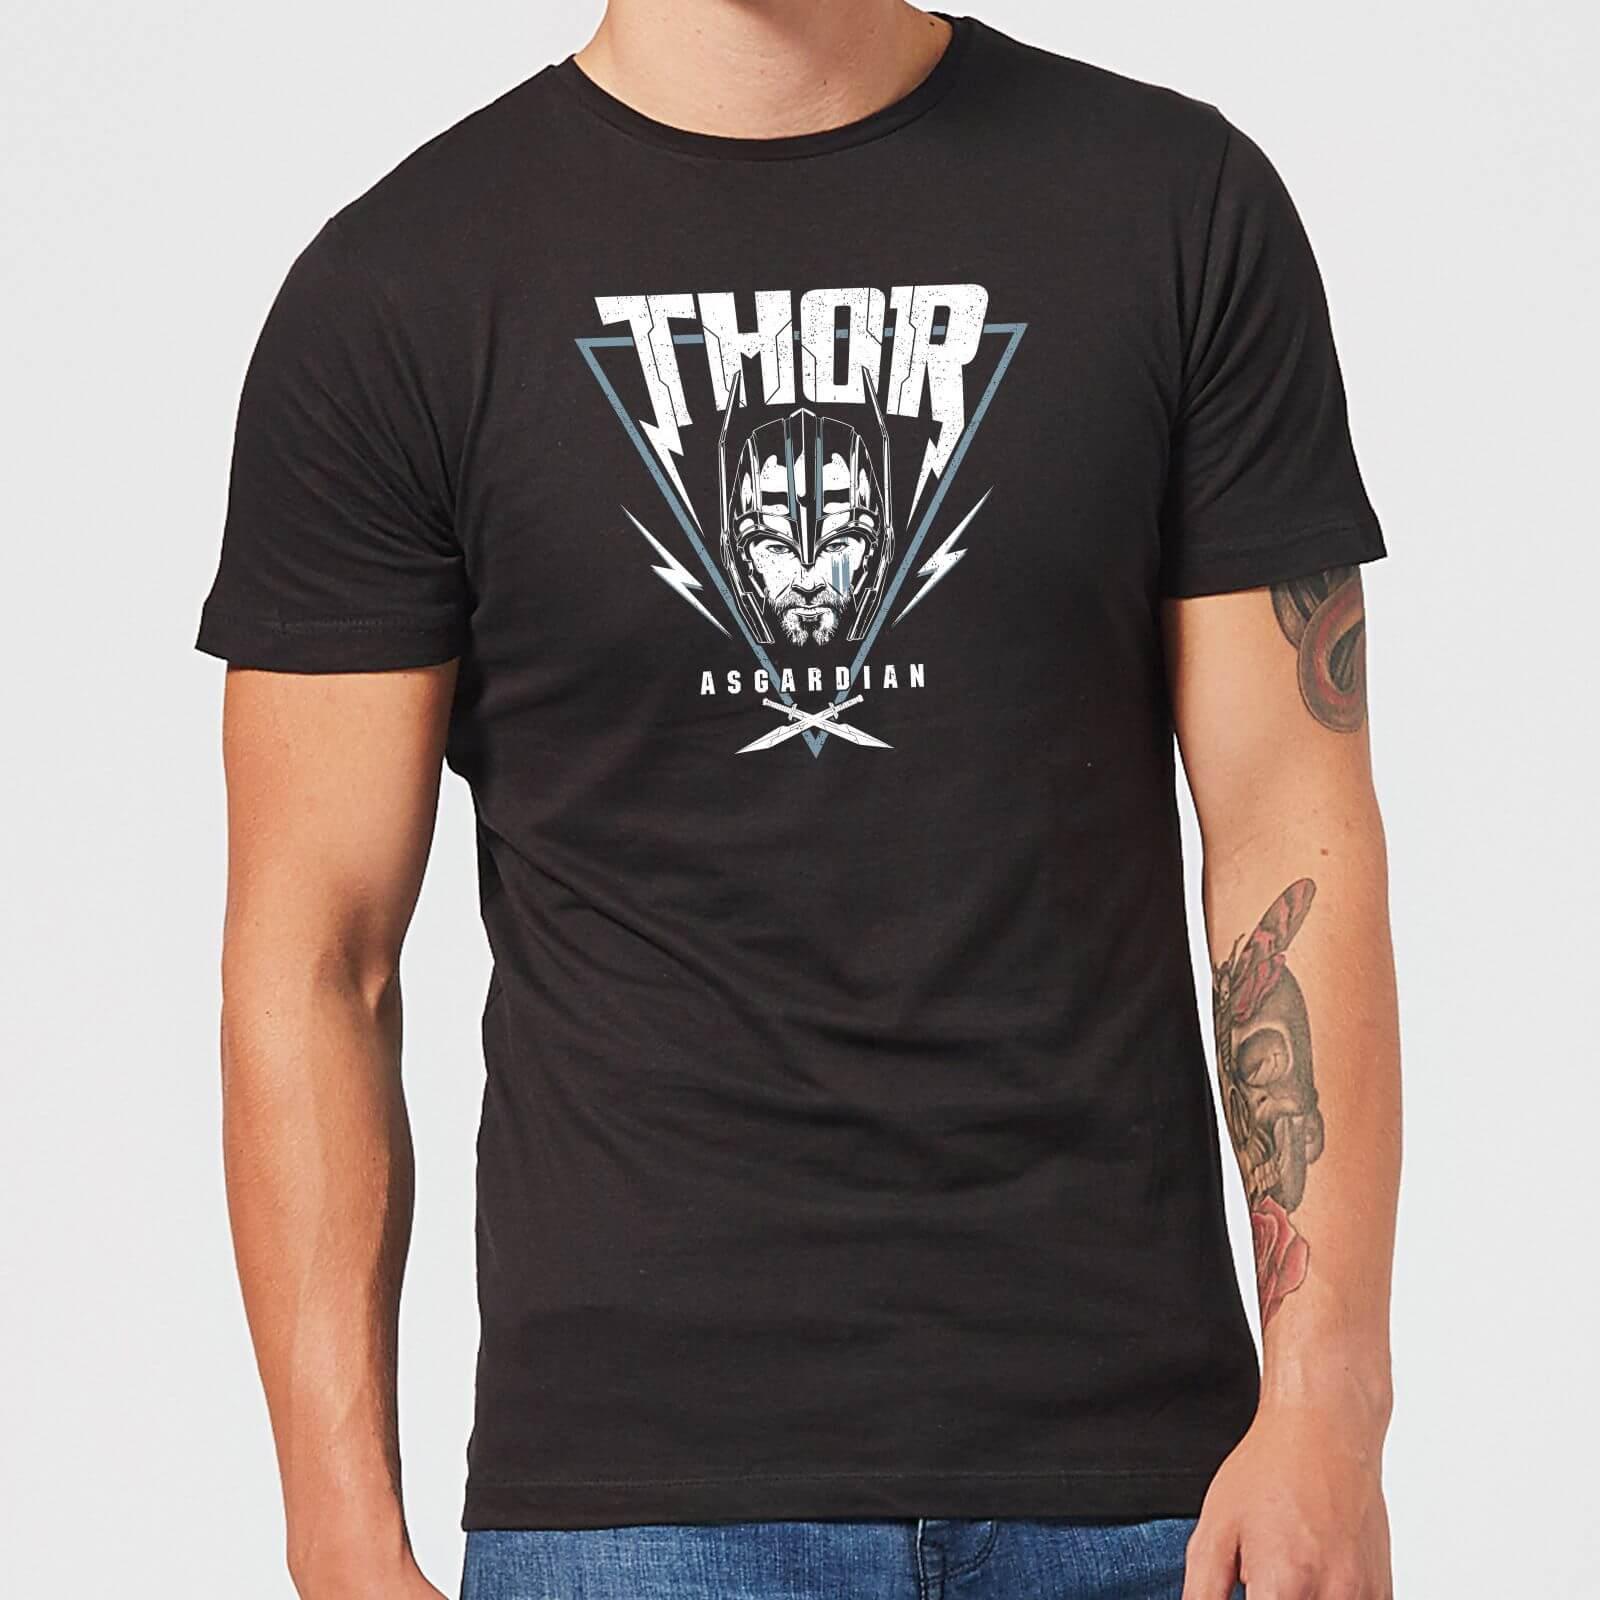 OfferteWeb.click 48-t-shirt-marvel-thor-ragnarok-asgardian-triangle-nero